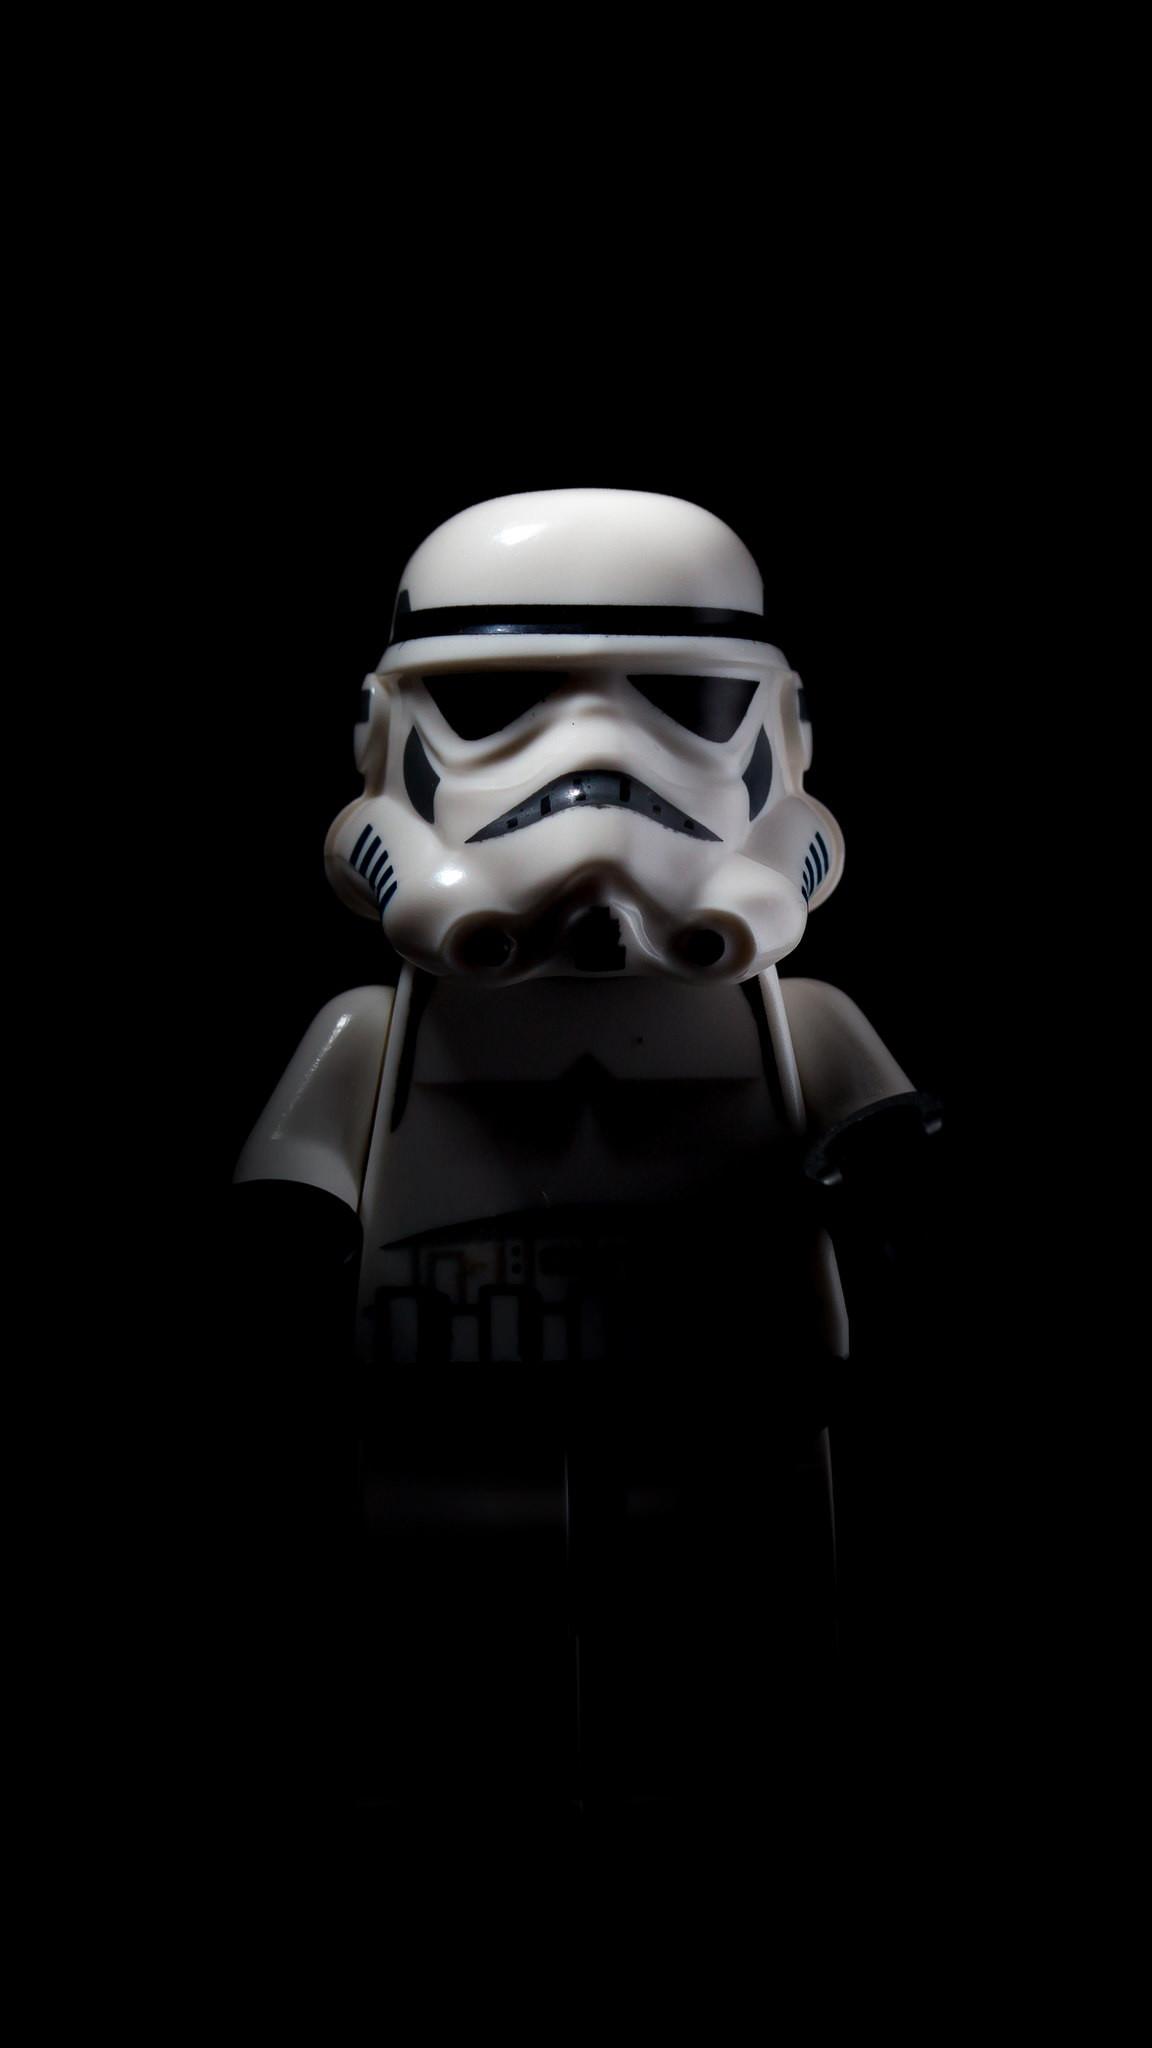 Stormtrooper shadow (iPhone 6) Black Wallpaper